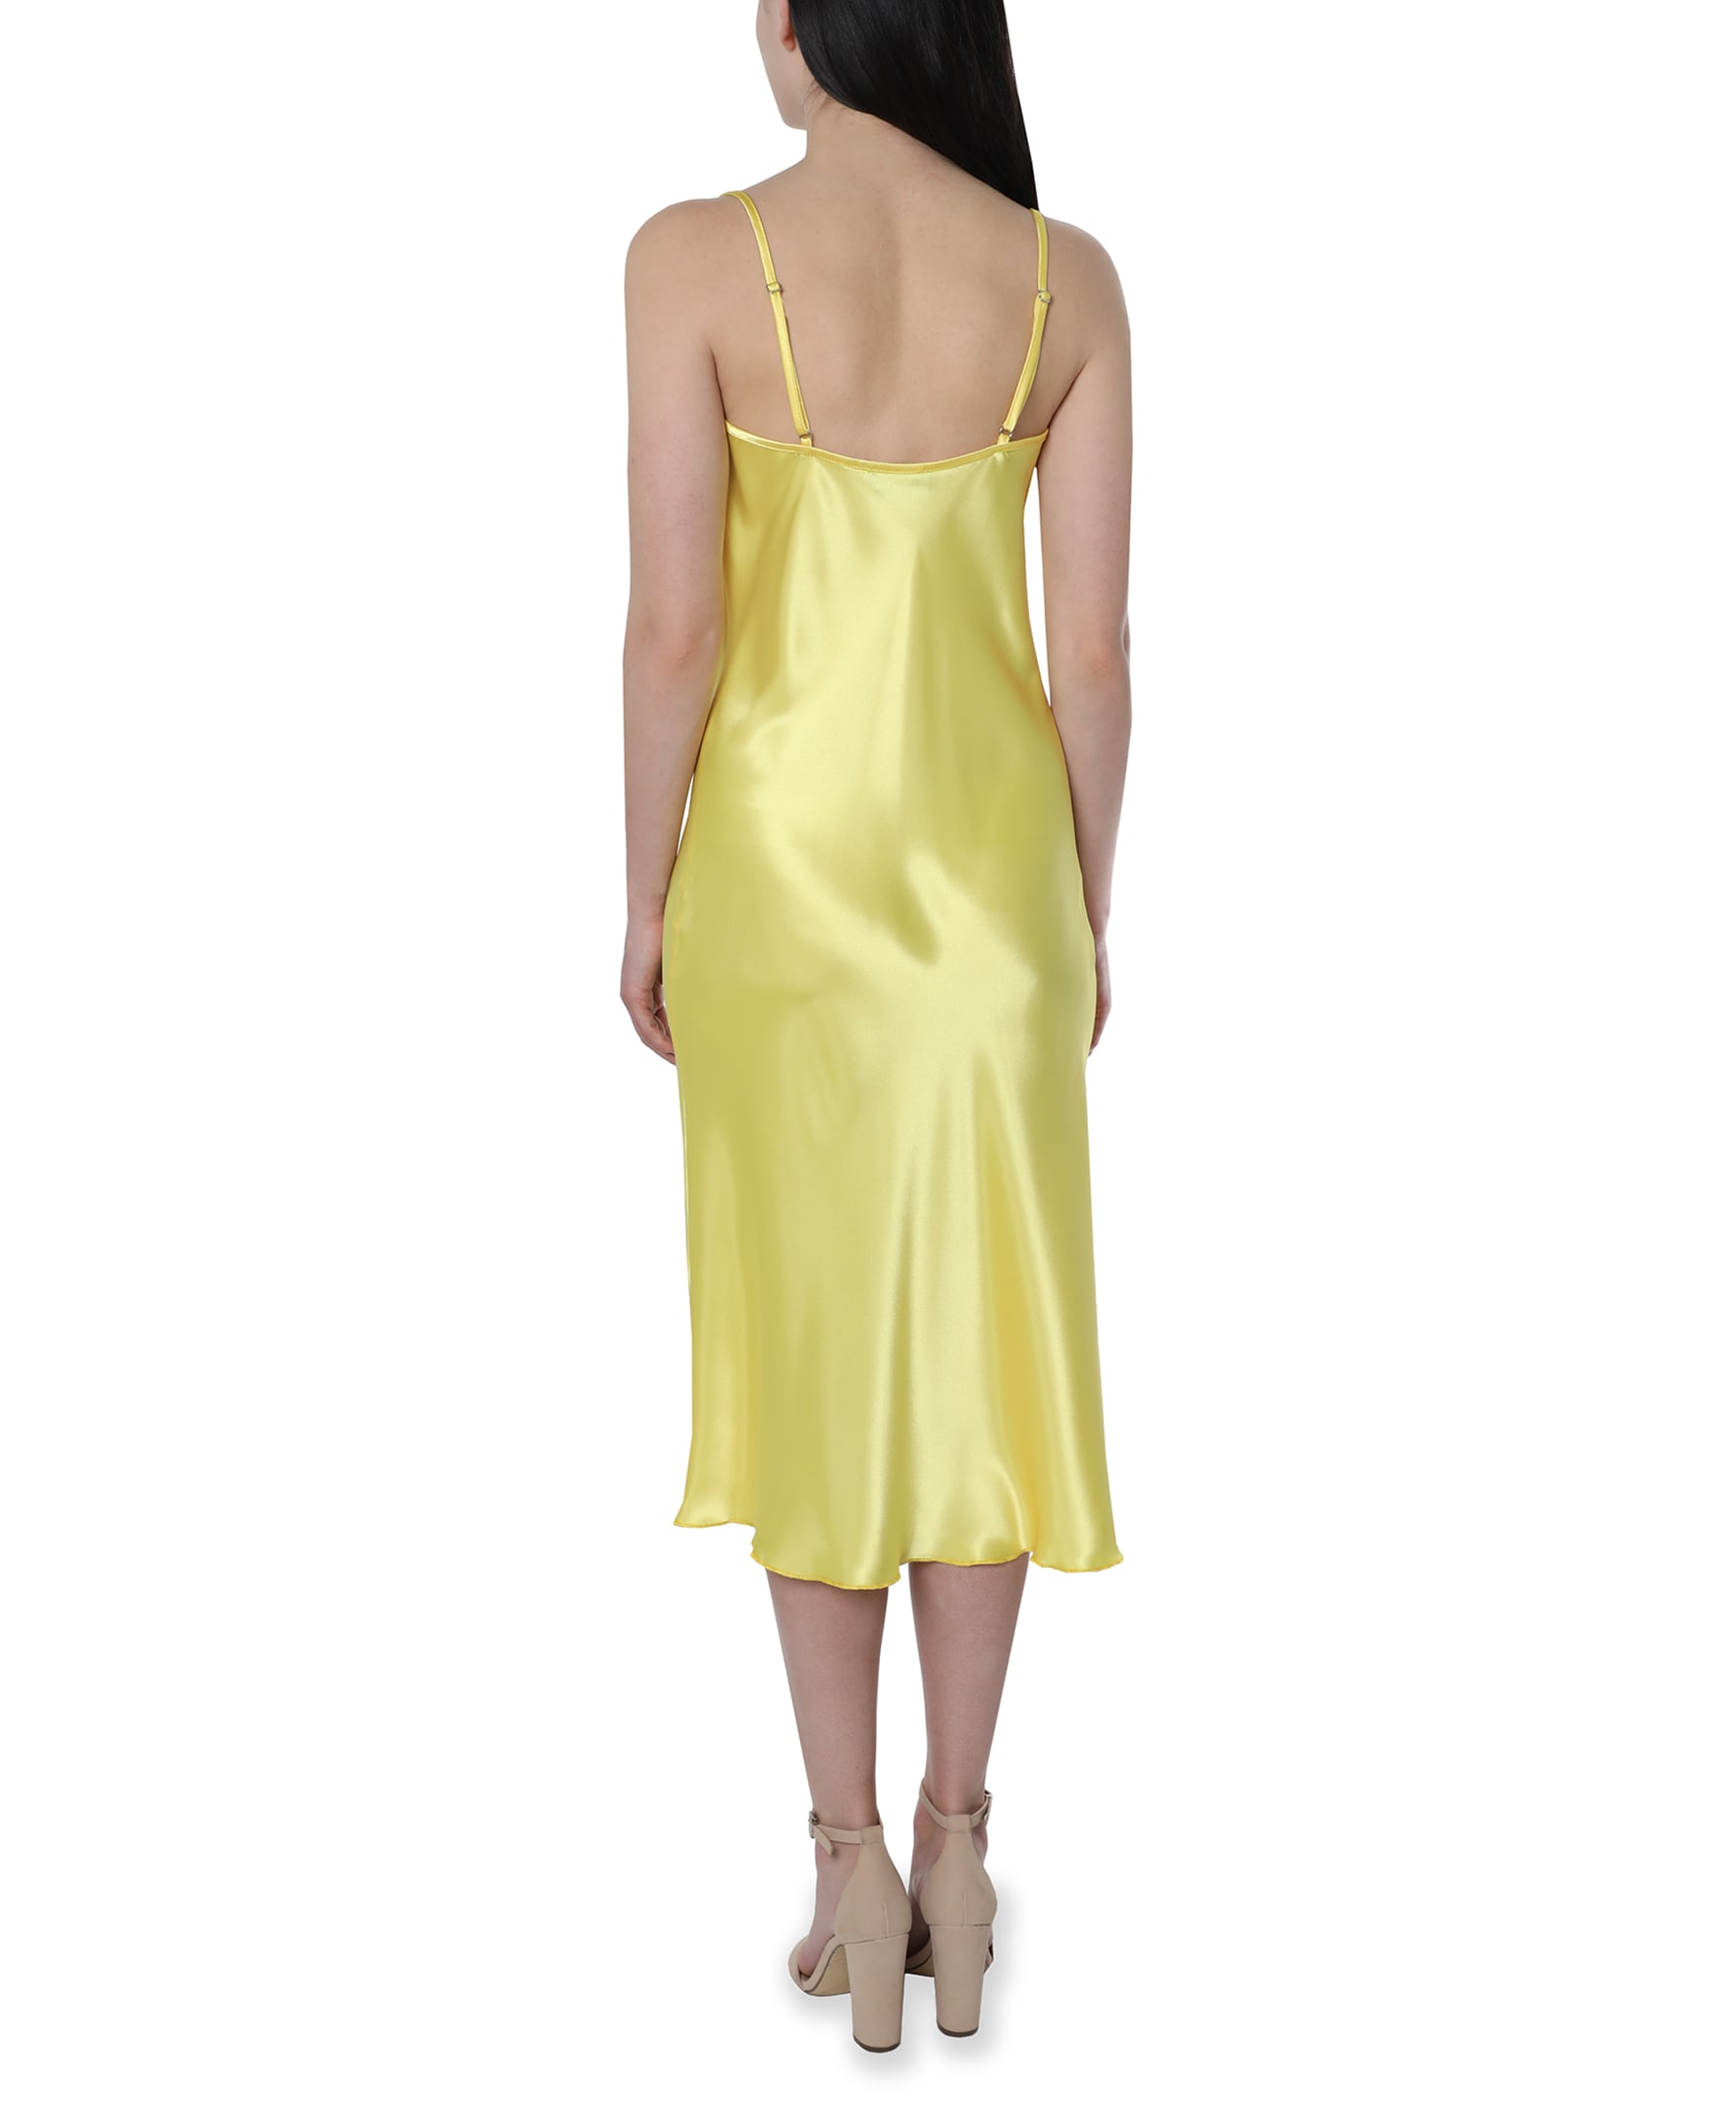 Bebe Satin Midi Dress - yellow - Back